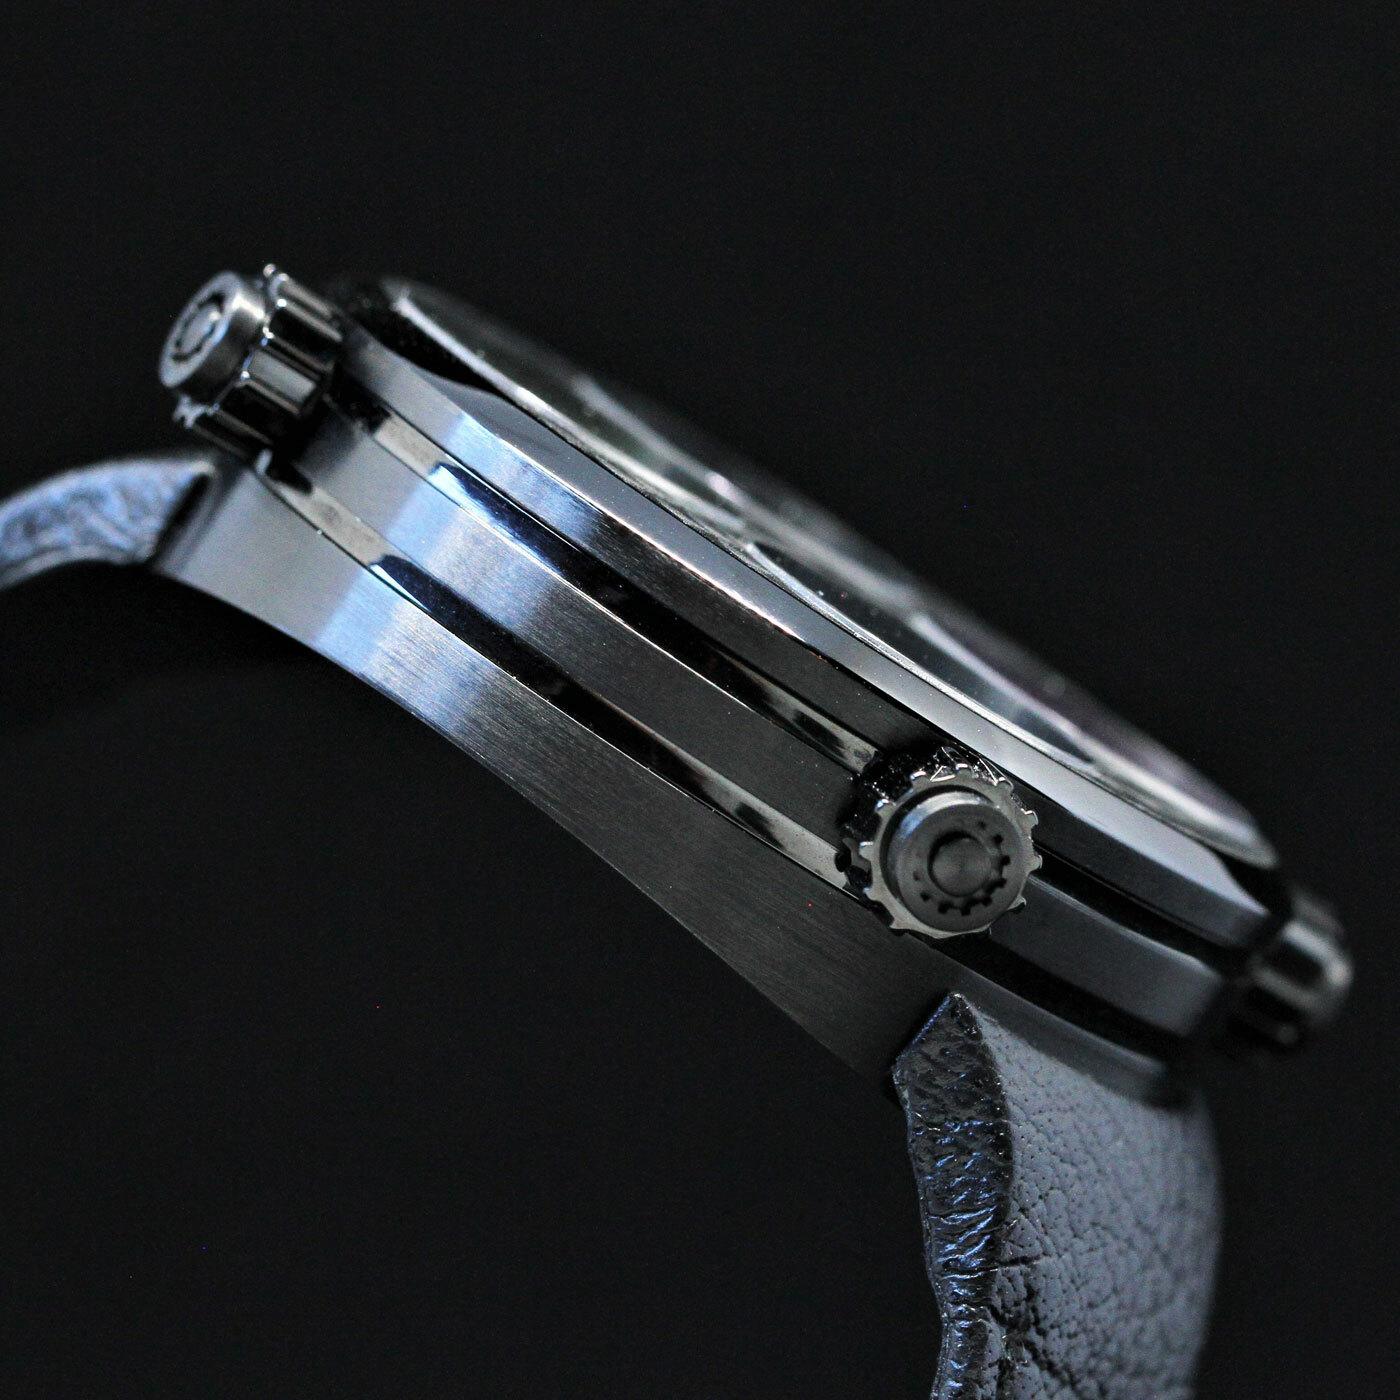 【MECCANICHE VELOCI メカニケ・ヴェローチ】ICON NITELITE BLACK アイコン ナイトライト(ブラック)/正規輸入品